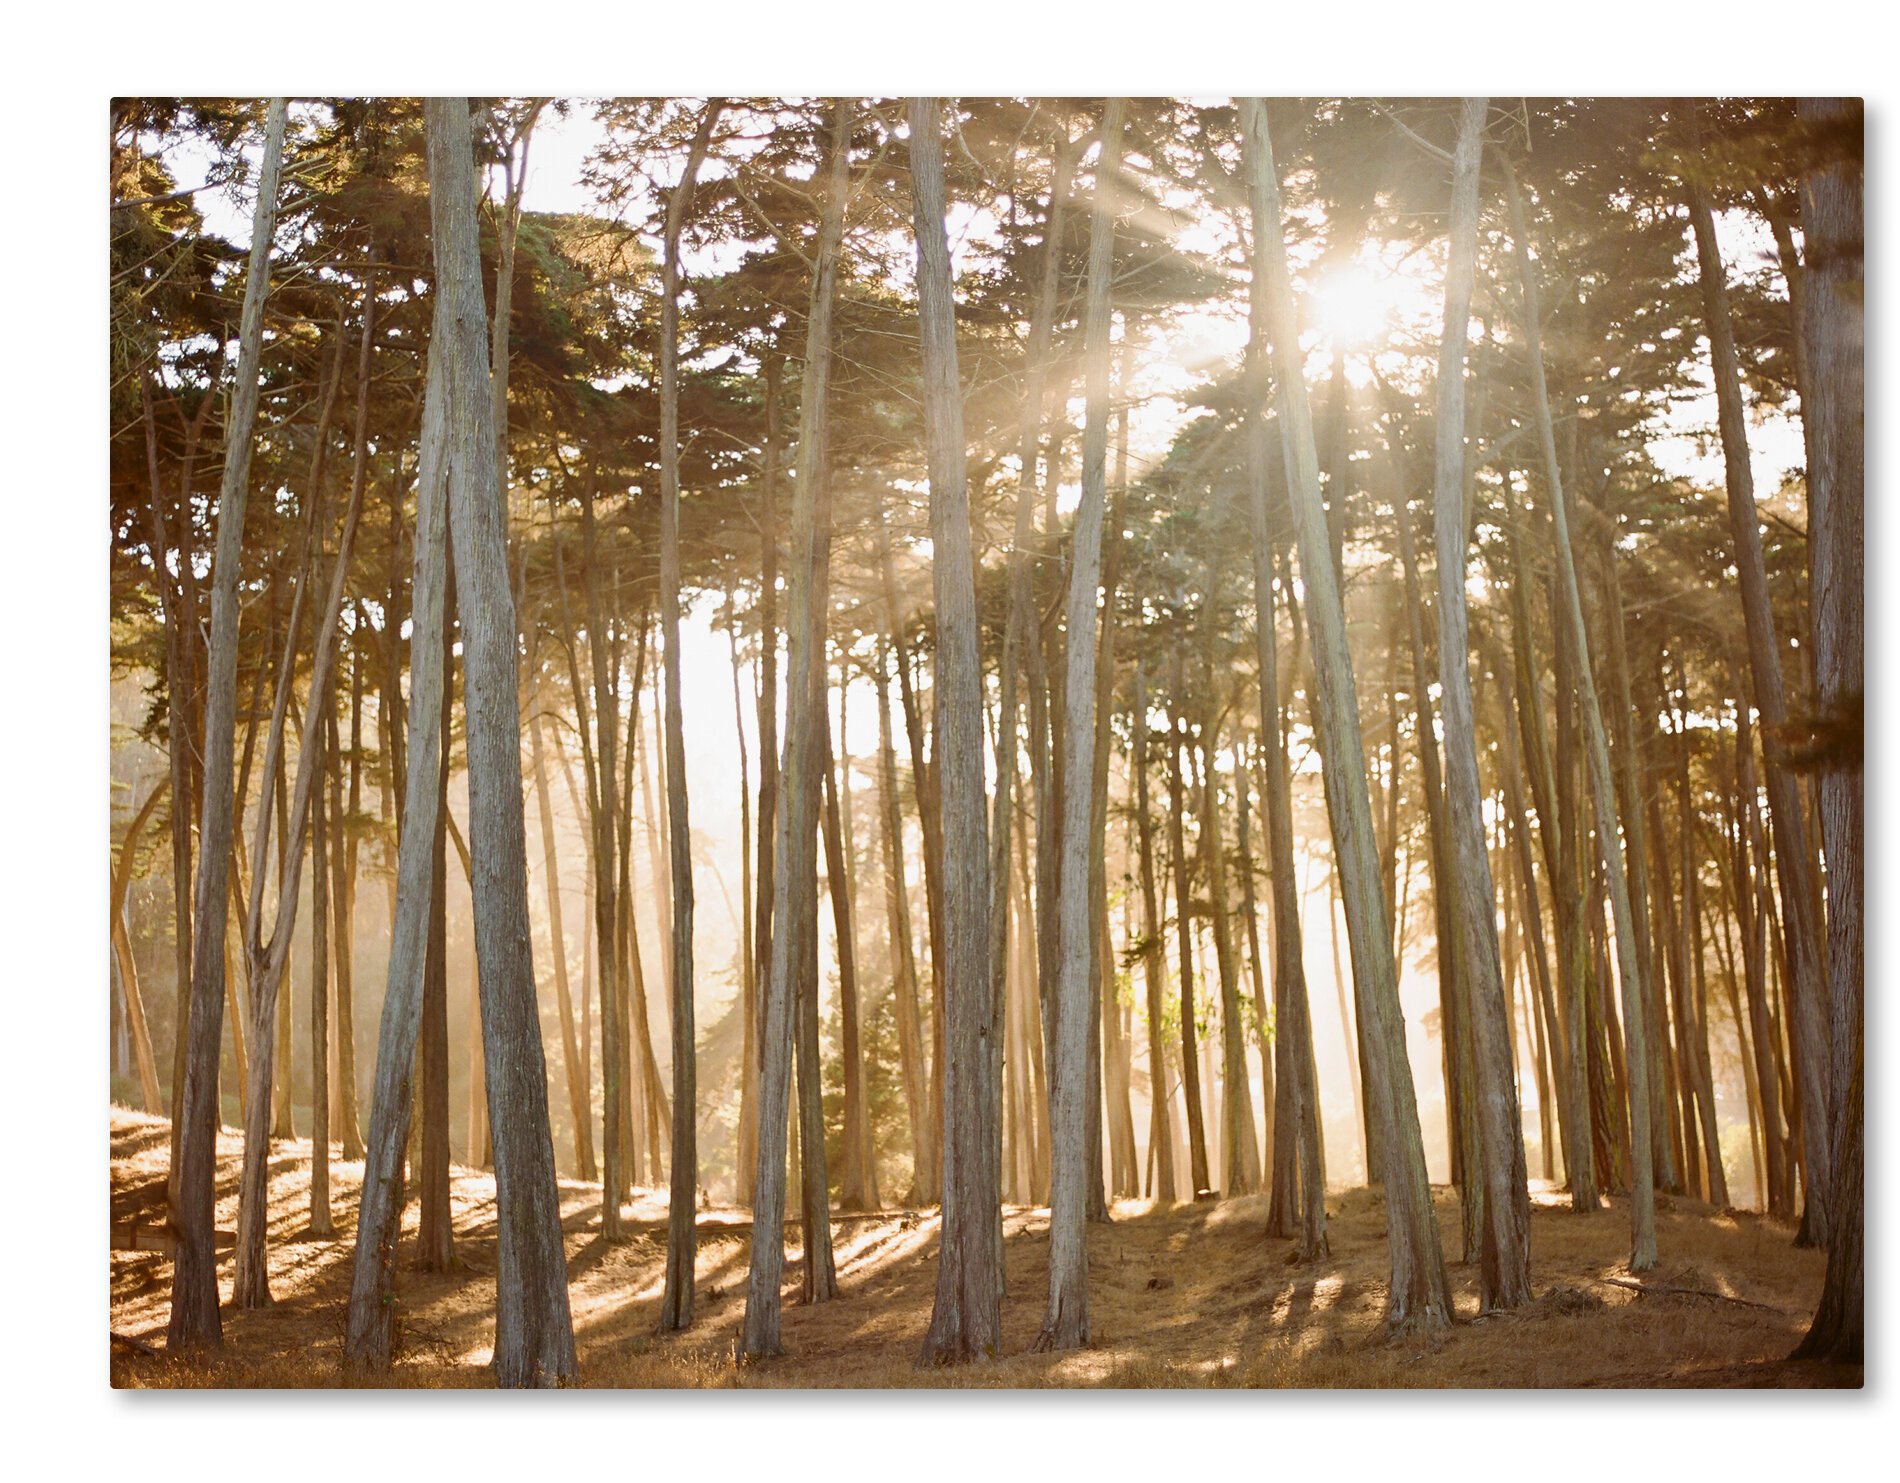 Trademark Art Presidio Sunset By Ariane Moshayedi Photographic Print On Wrapped Canvas Wayfair